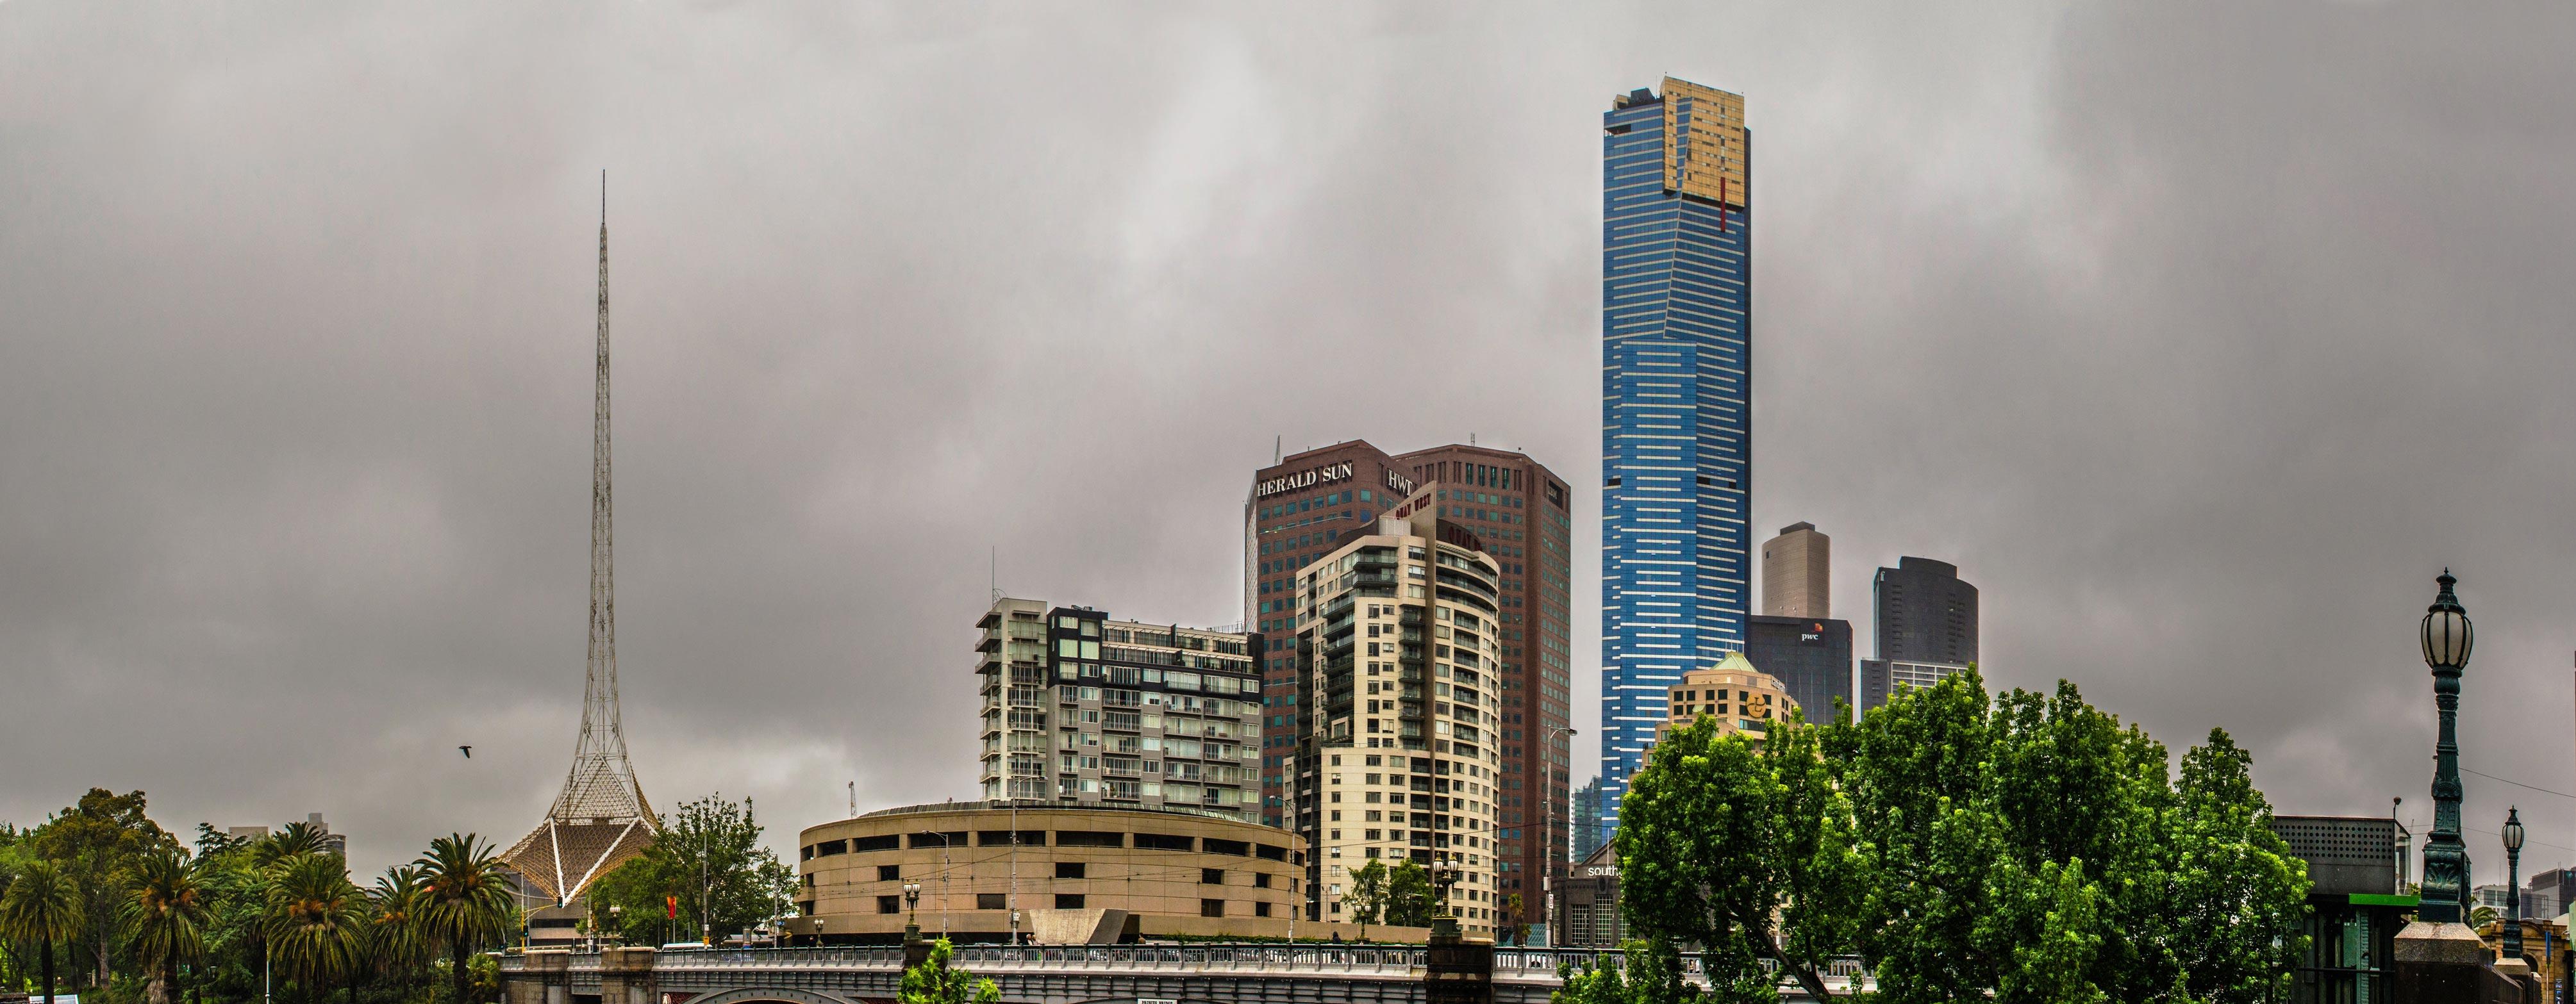 Paesaggi-Australia - DSC 0381  - Melbourne Australia - Melbourne Australia